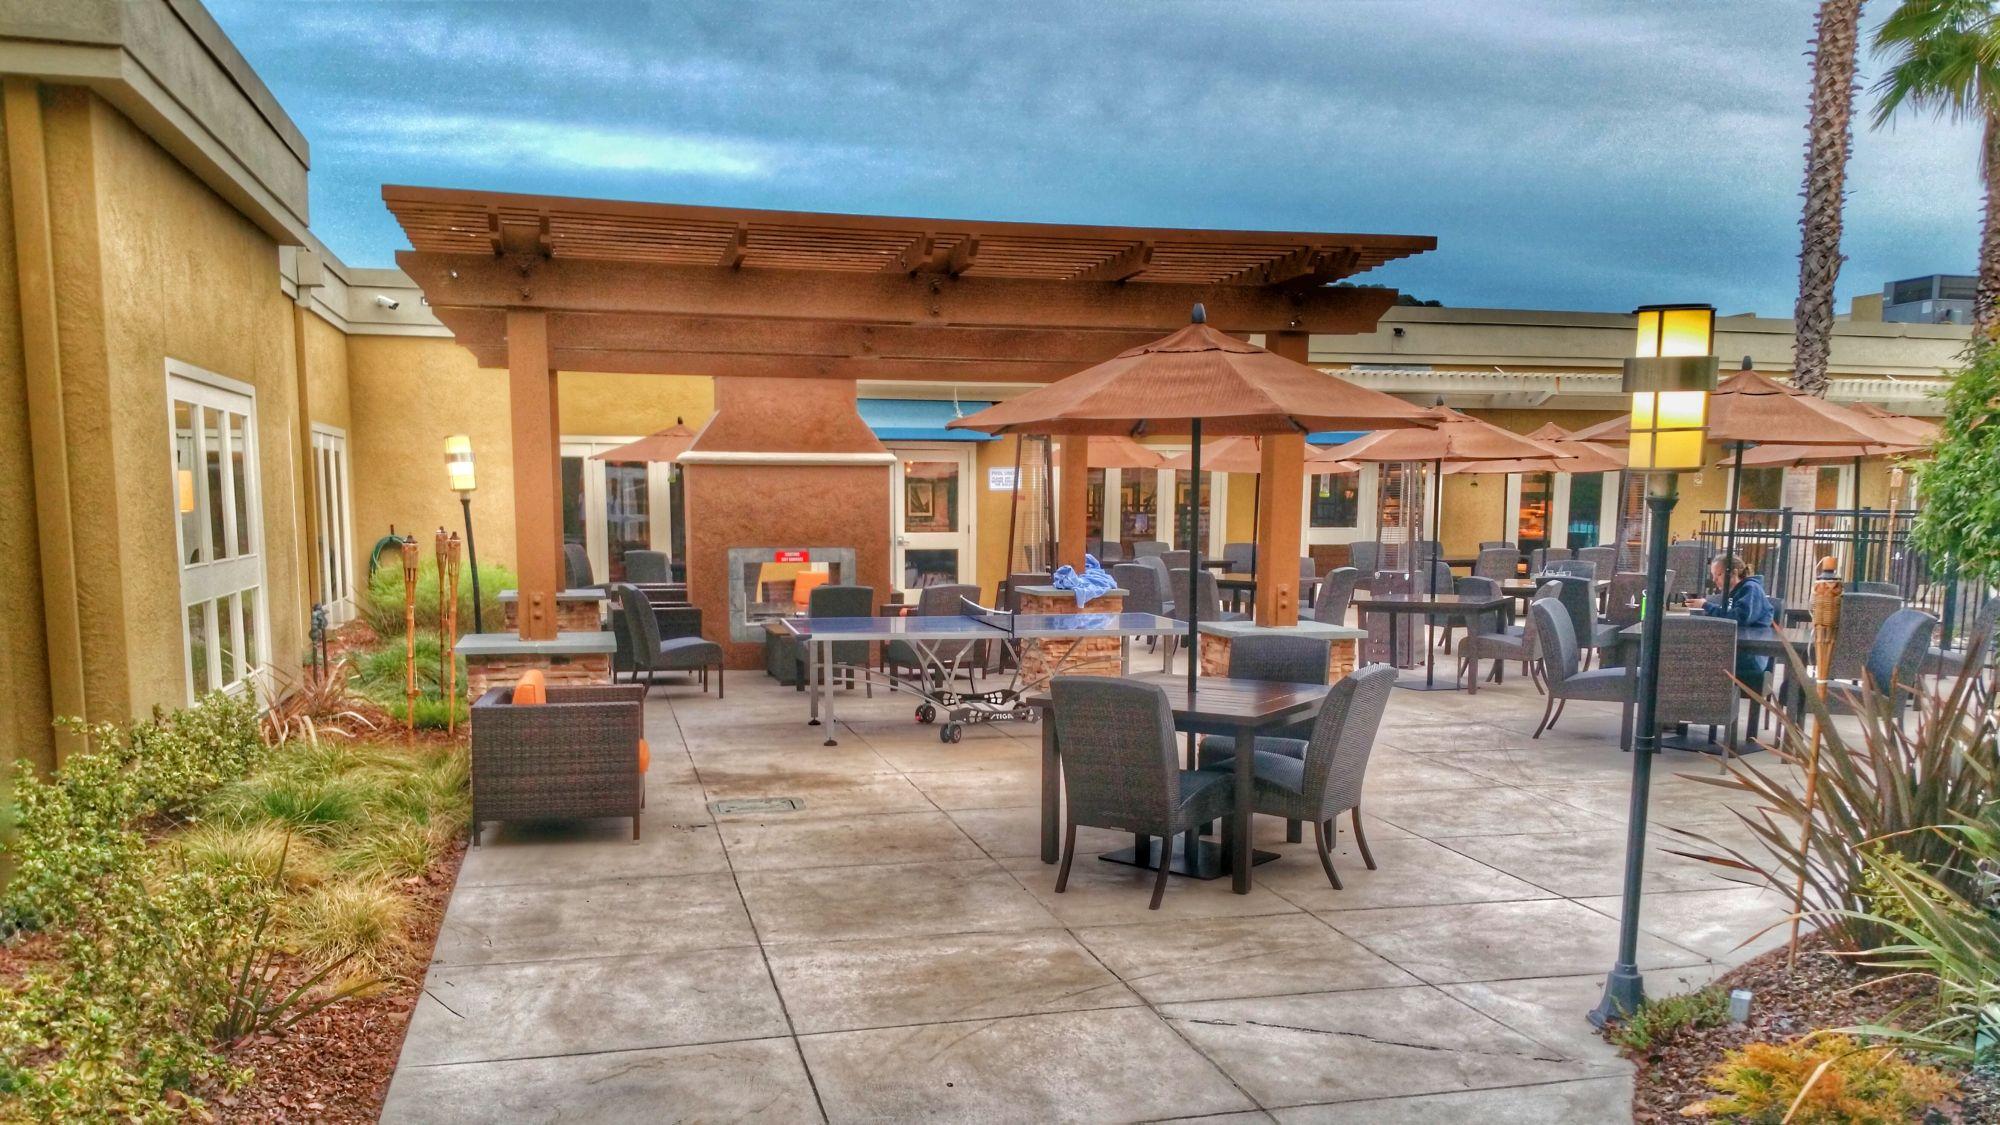 Hotel Review: SPG Four Points by Sheraton San Rafael